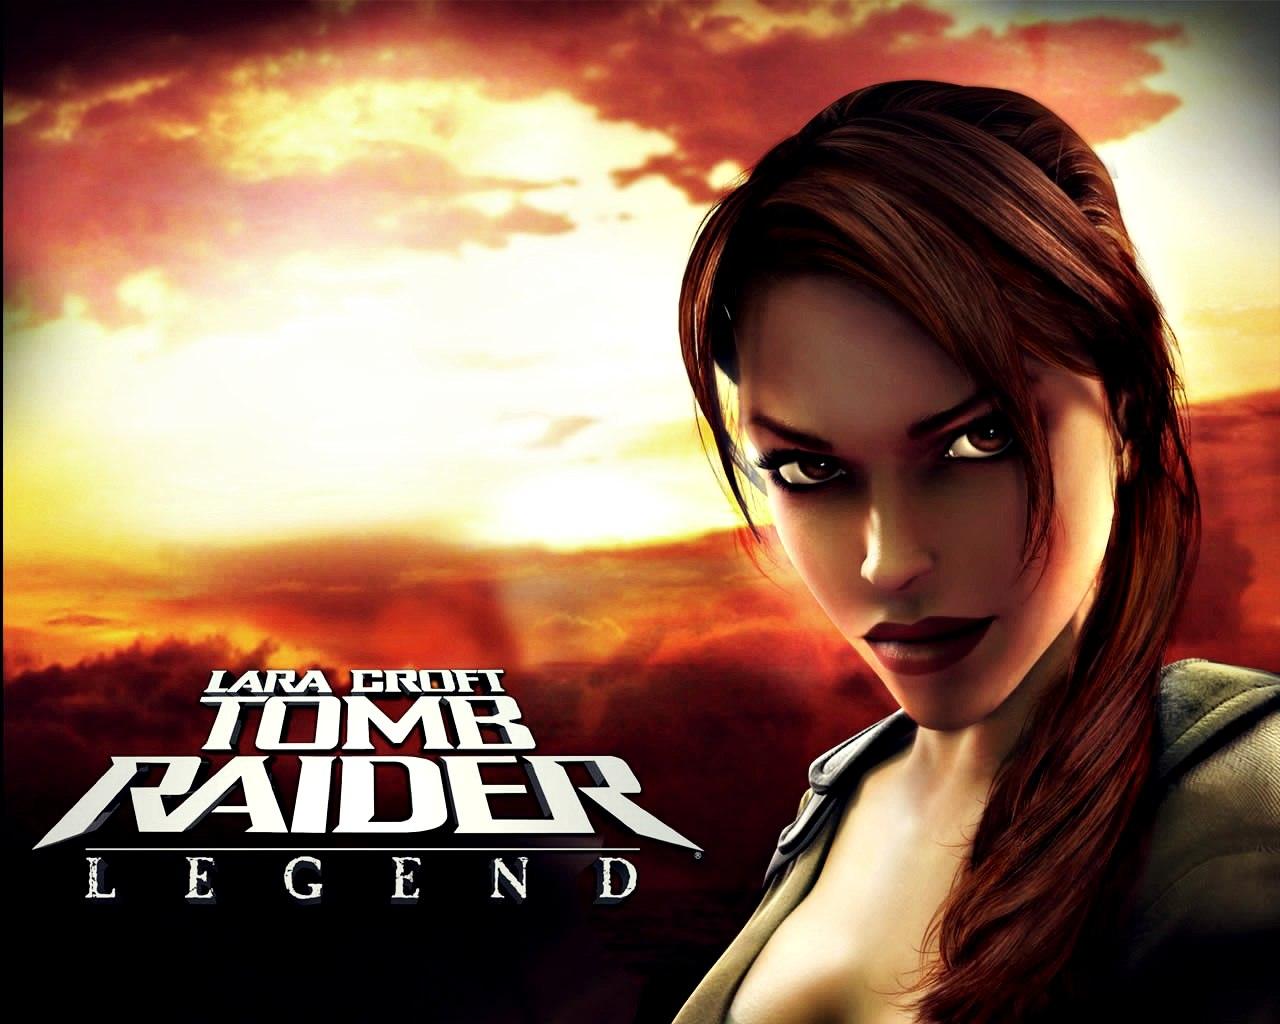 Tomb Raider Legend 3D Symbian Game (240×320 / 320×240